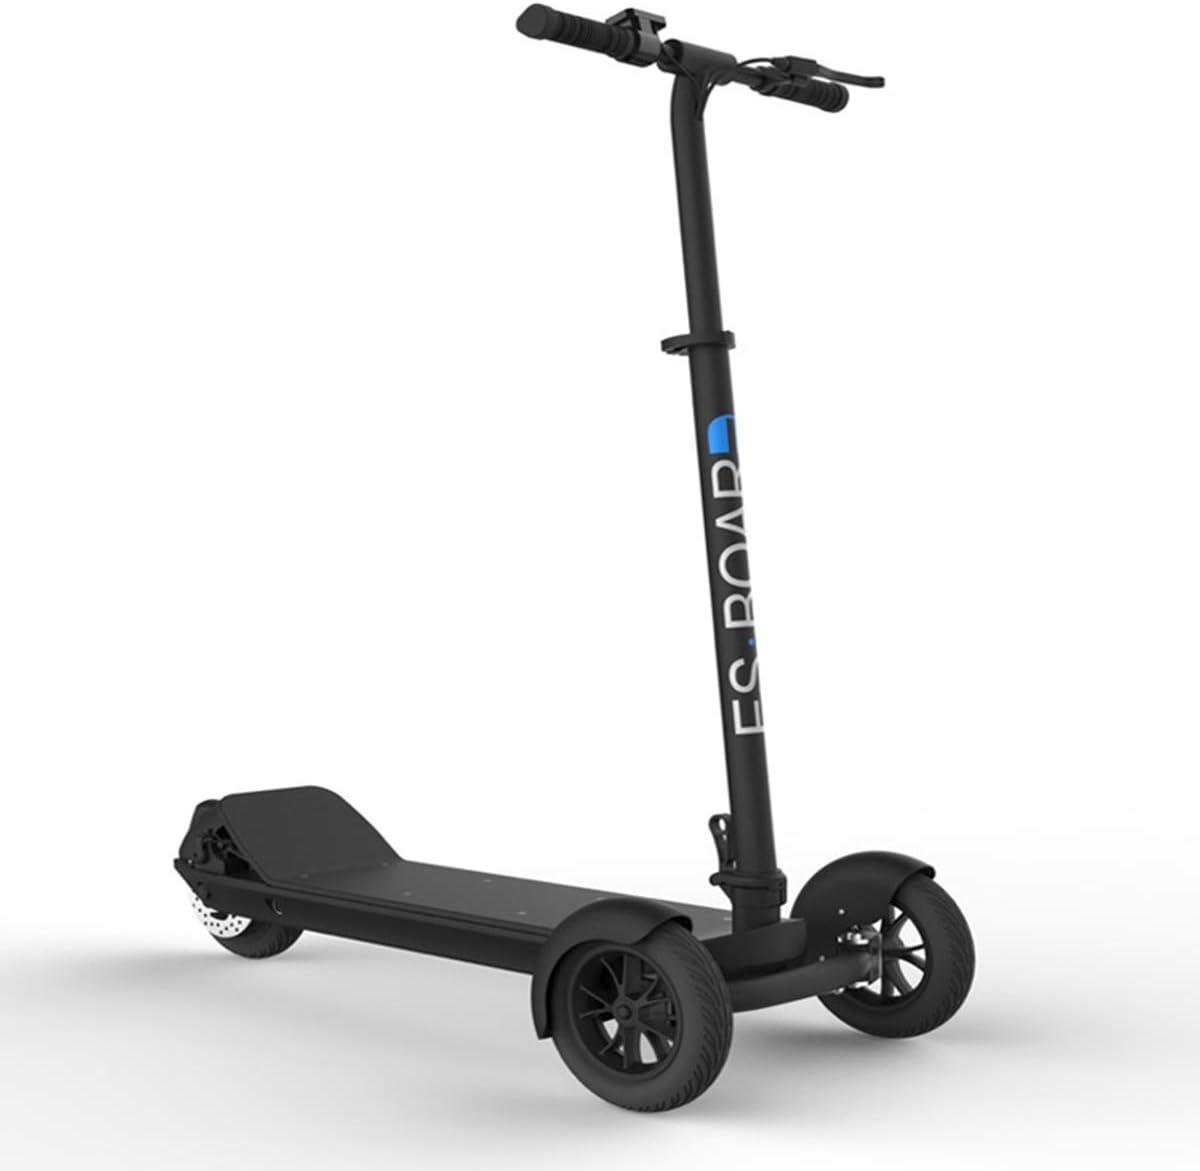 Dapang Scooter para Adultos, 3 Ruedas, Barra en T, manija de Altura Ajustable, patinetas, 500W 48V, Bicicleta eléctrica Impermeable con Rango de 30 Millas, Marco Plegable,1,30km